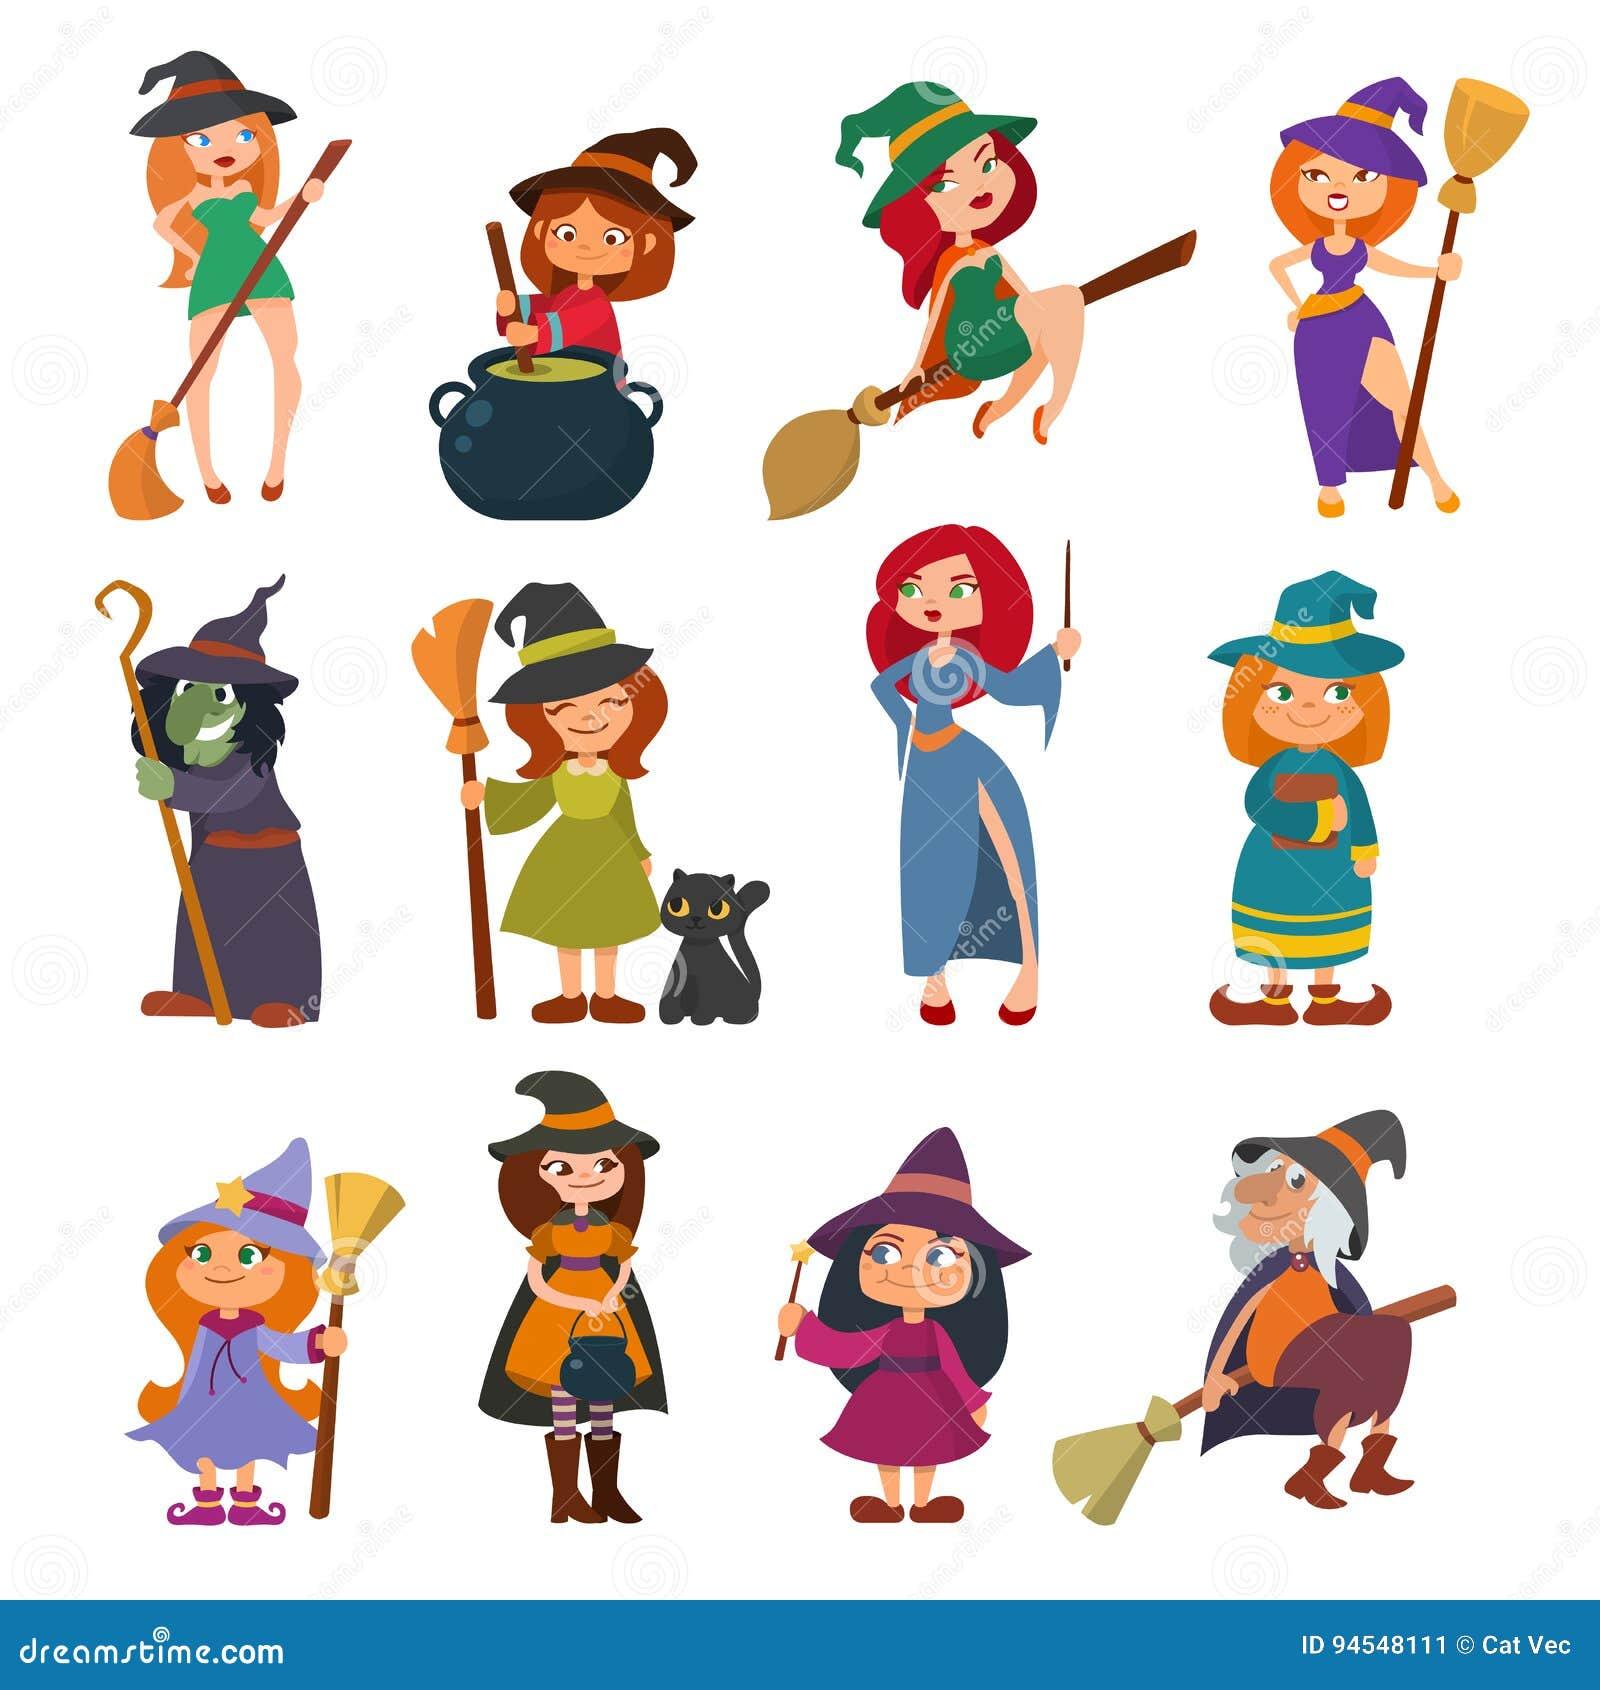 broom cartoons illustrations amp vector stock images